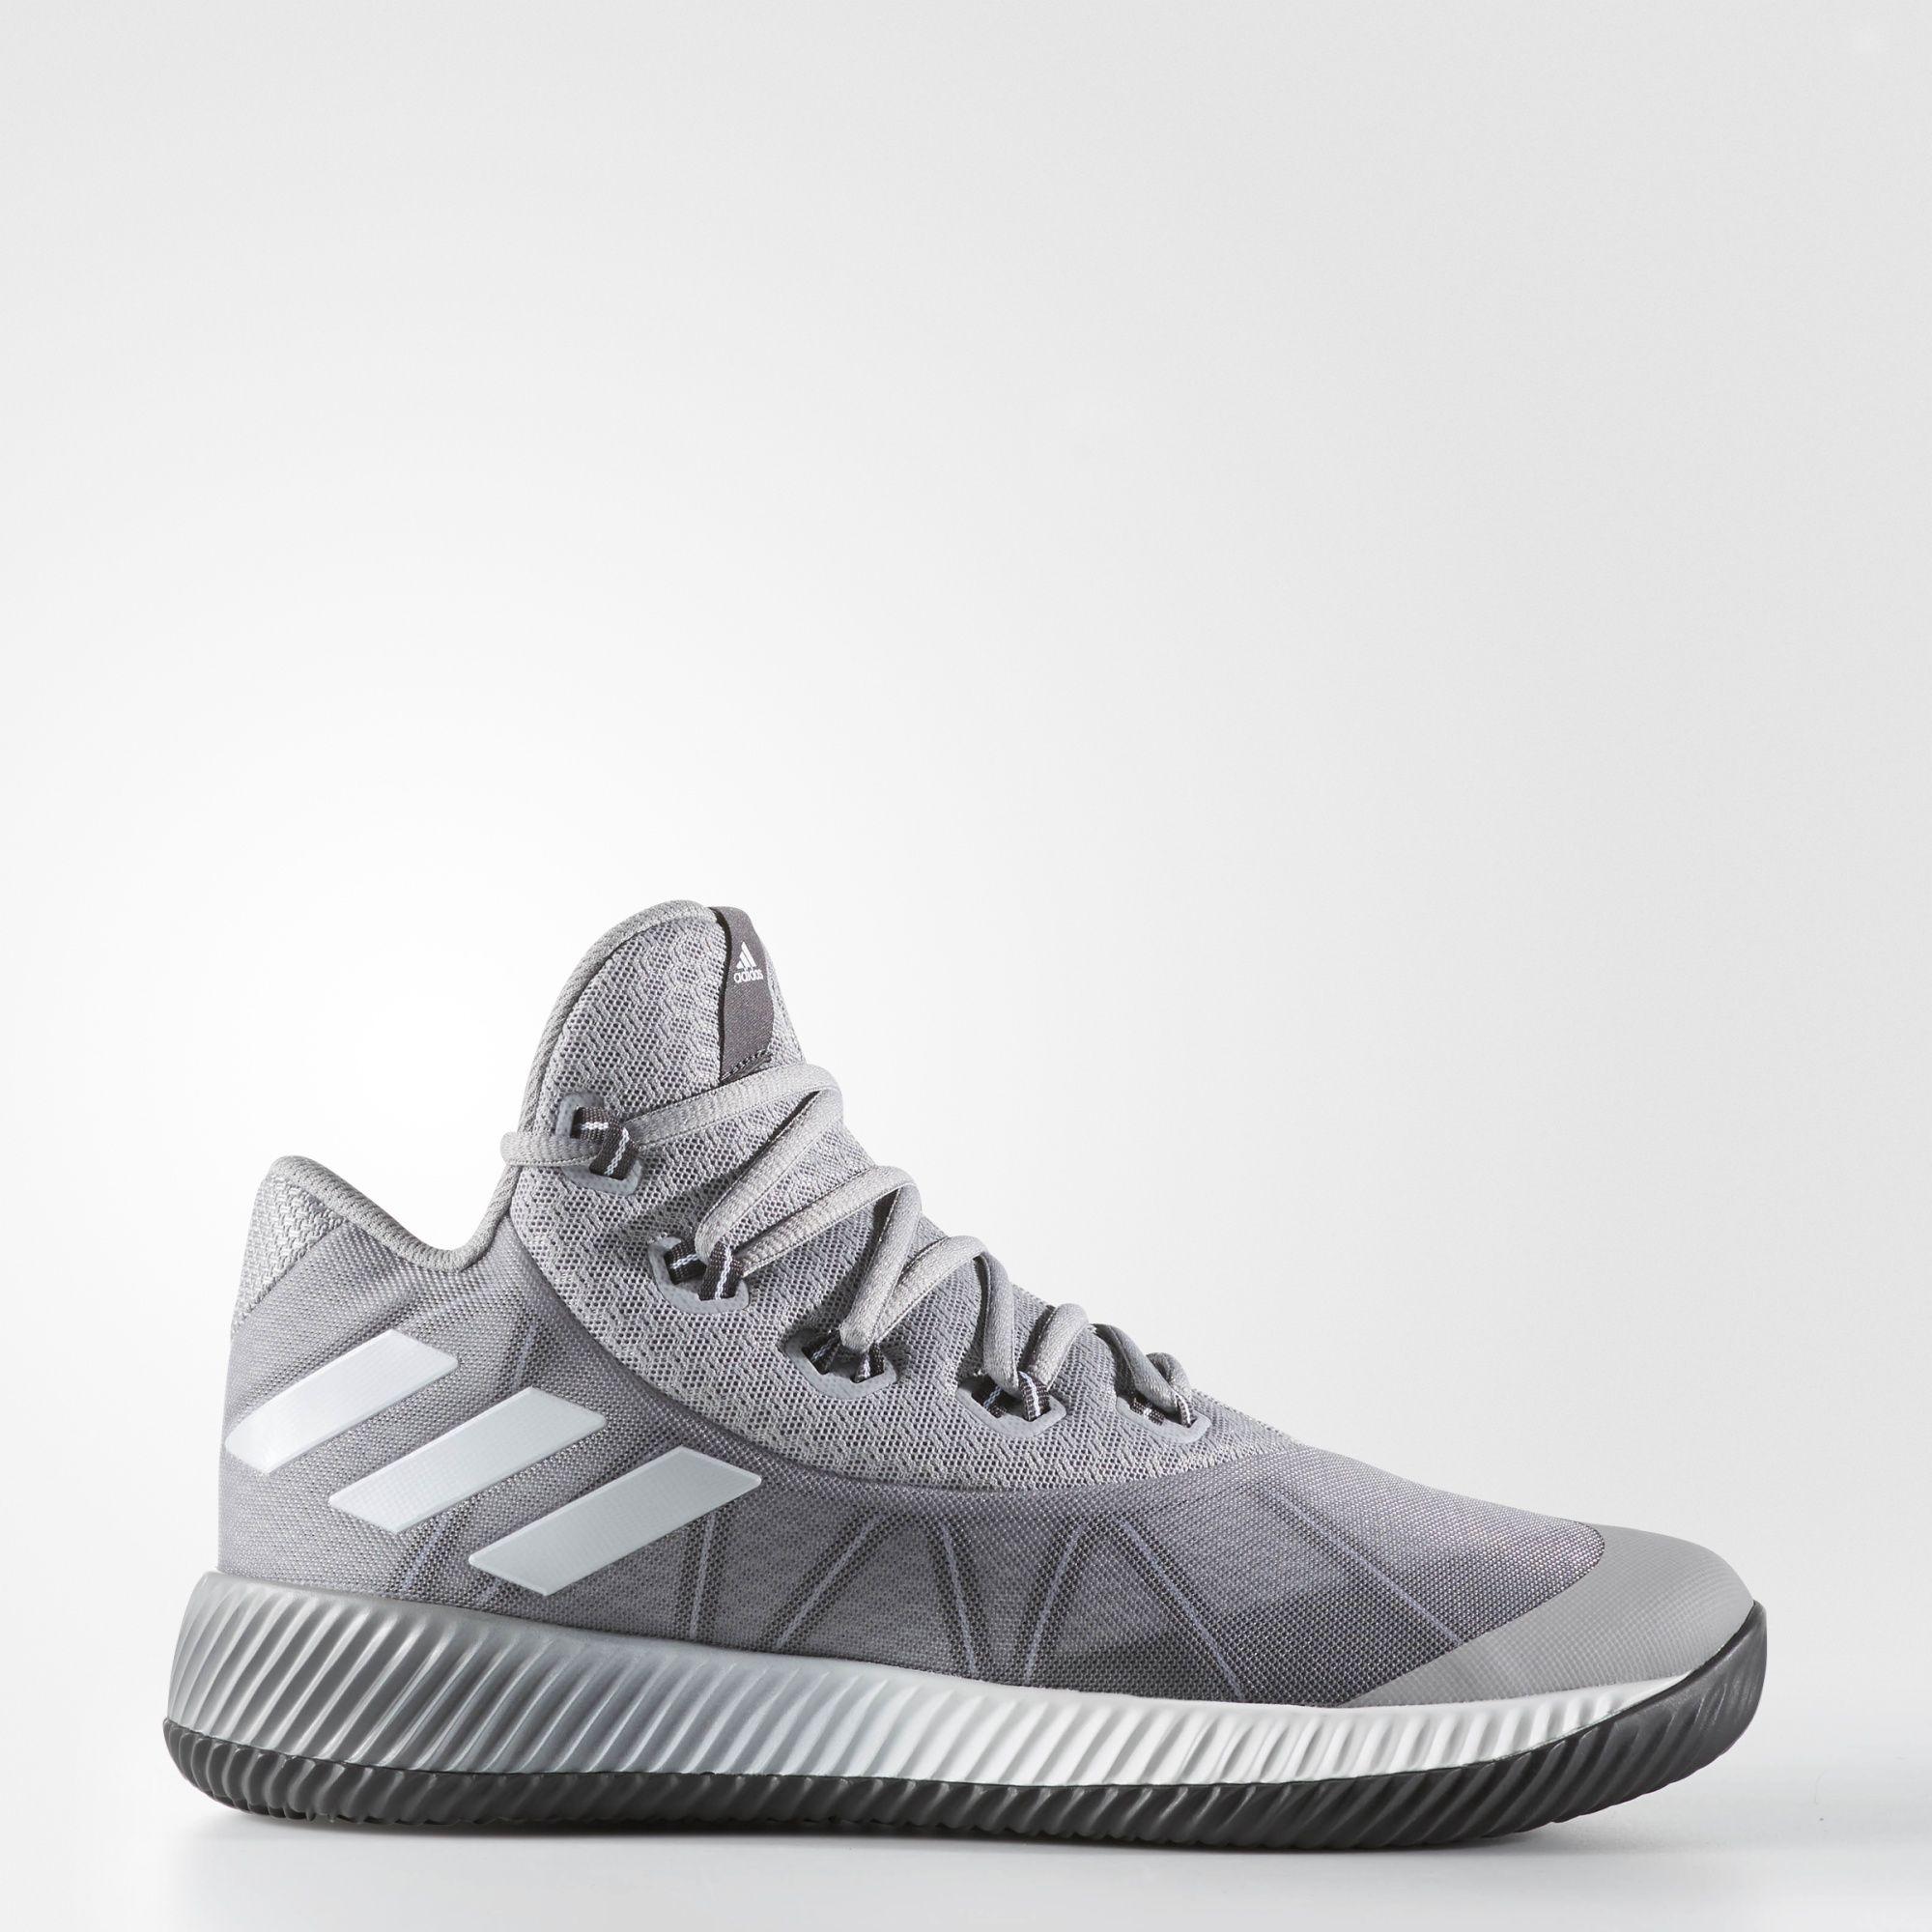 adidas basketball shoes 2017. adidas light em up 2017 basketball shoes